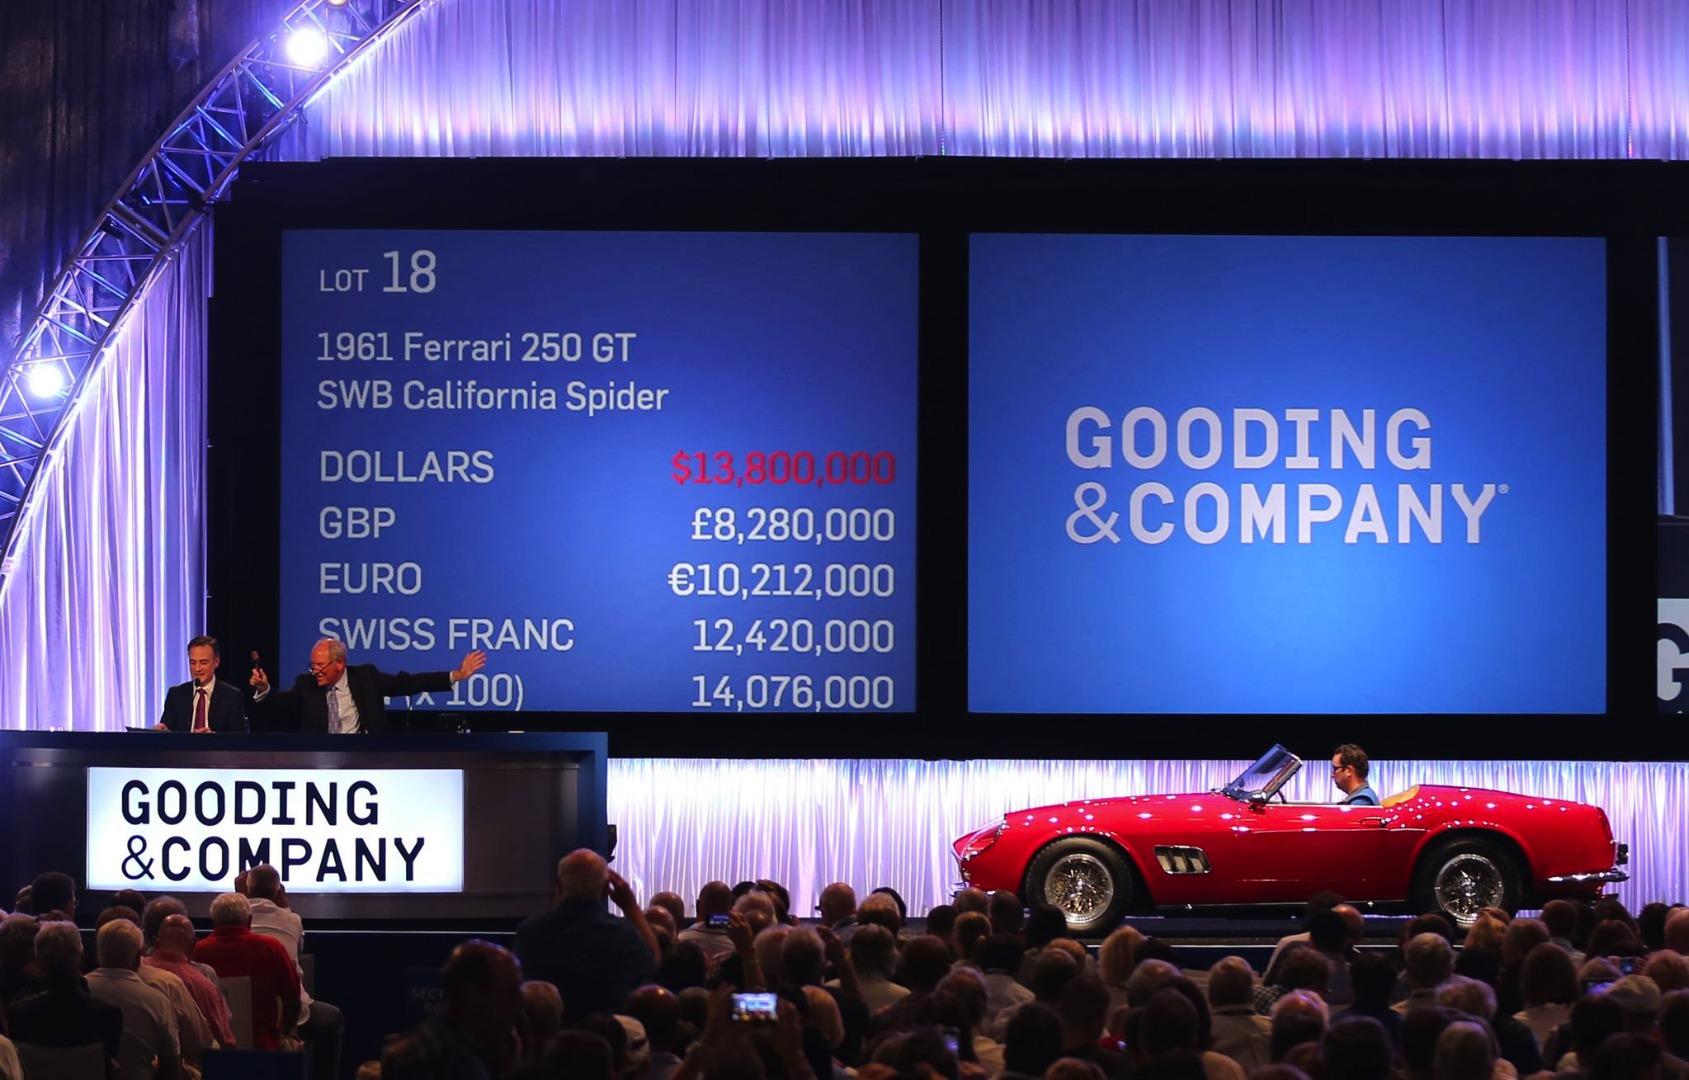 Ferrari GTS 328 Grande PVC Banner Garage Lavoro Shop Auto Show Banner